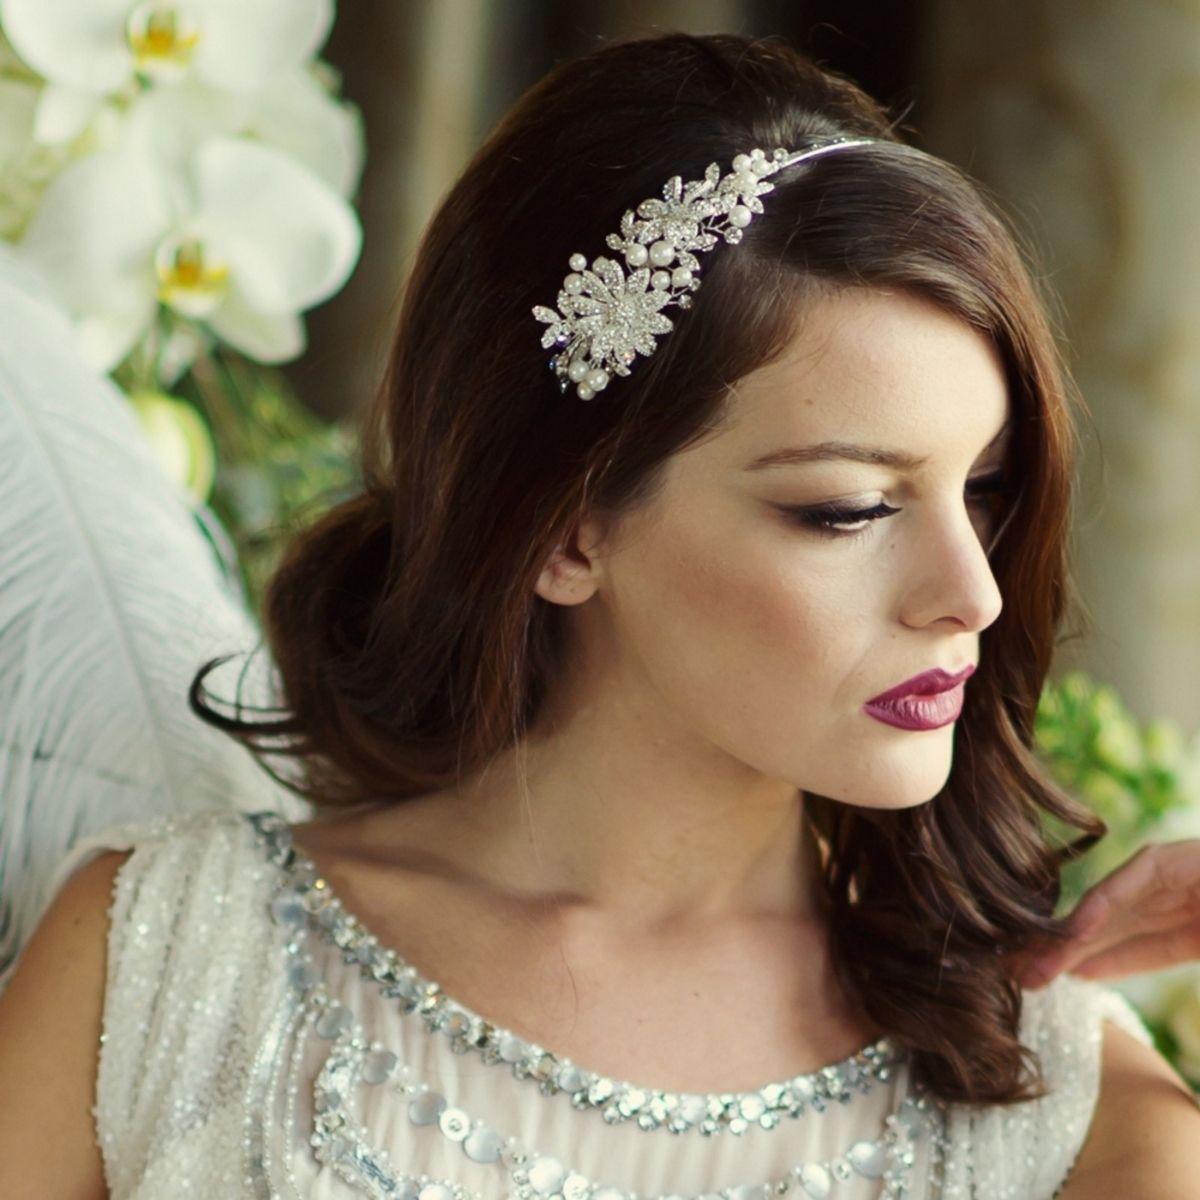 aye do ltd scarlett wedding side tiara hdb9 awj 59 99 http